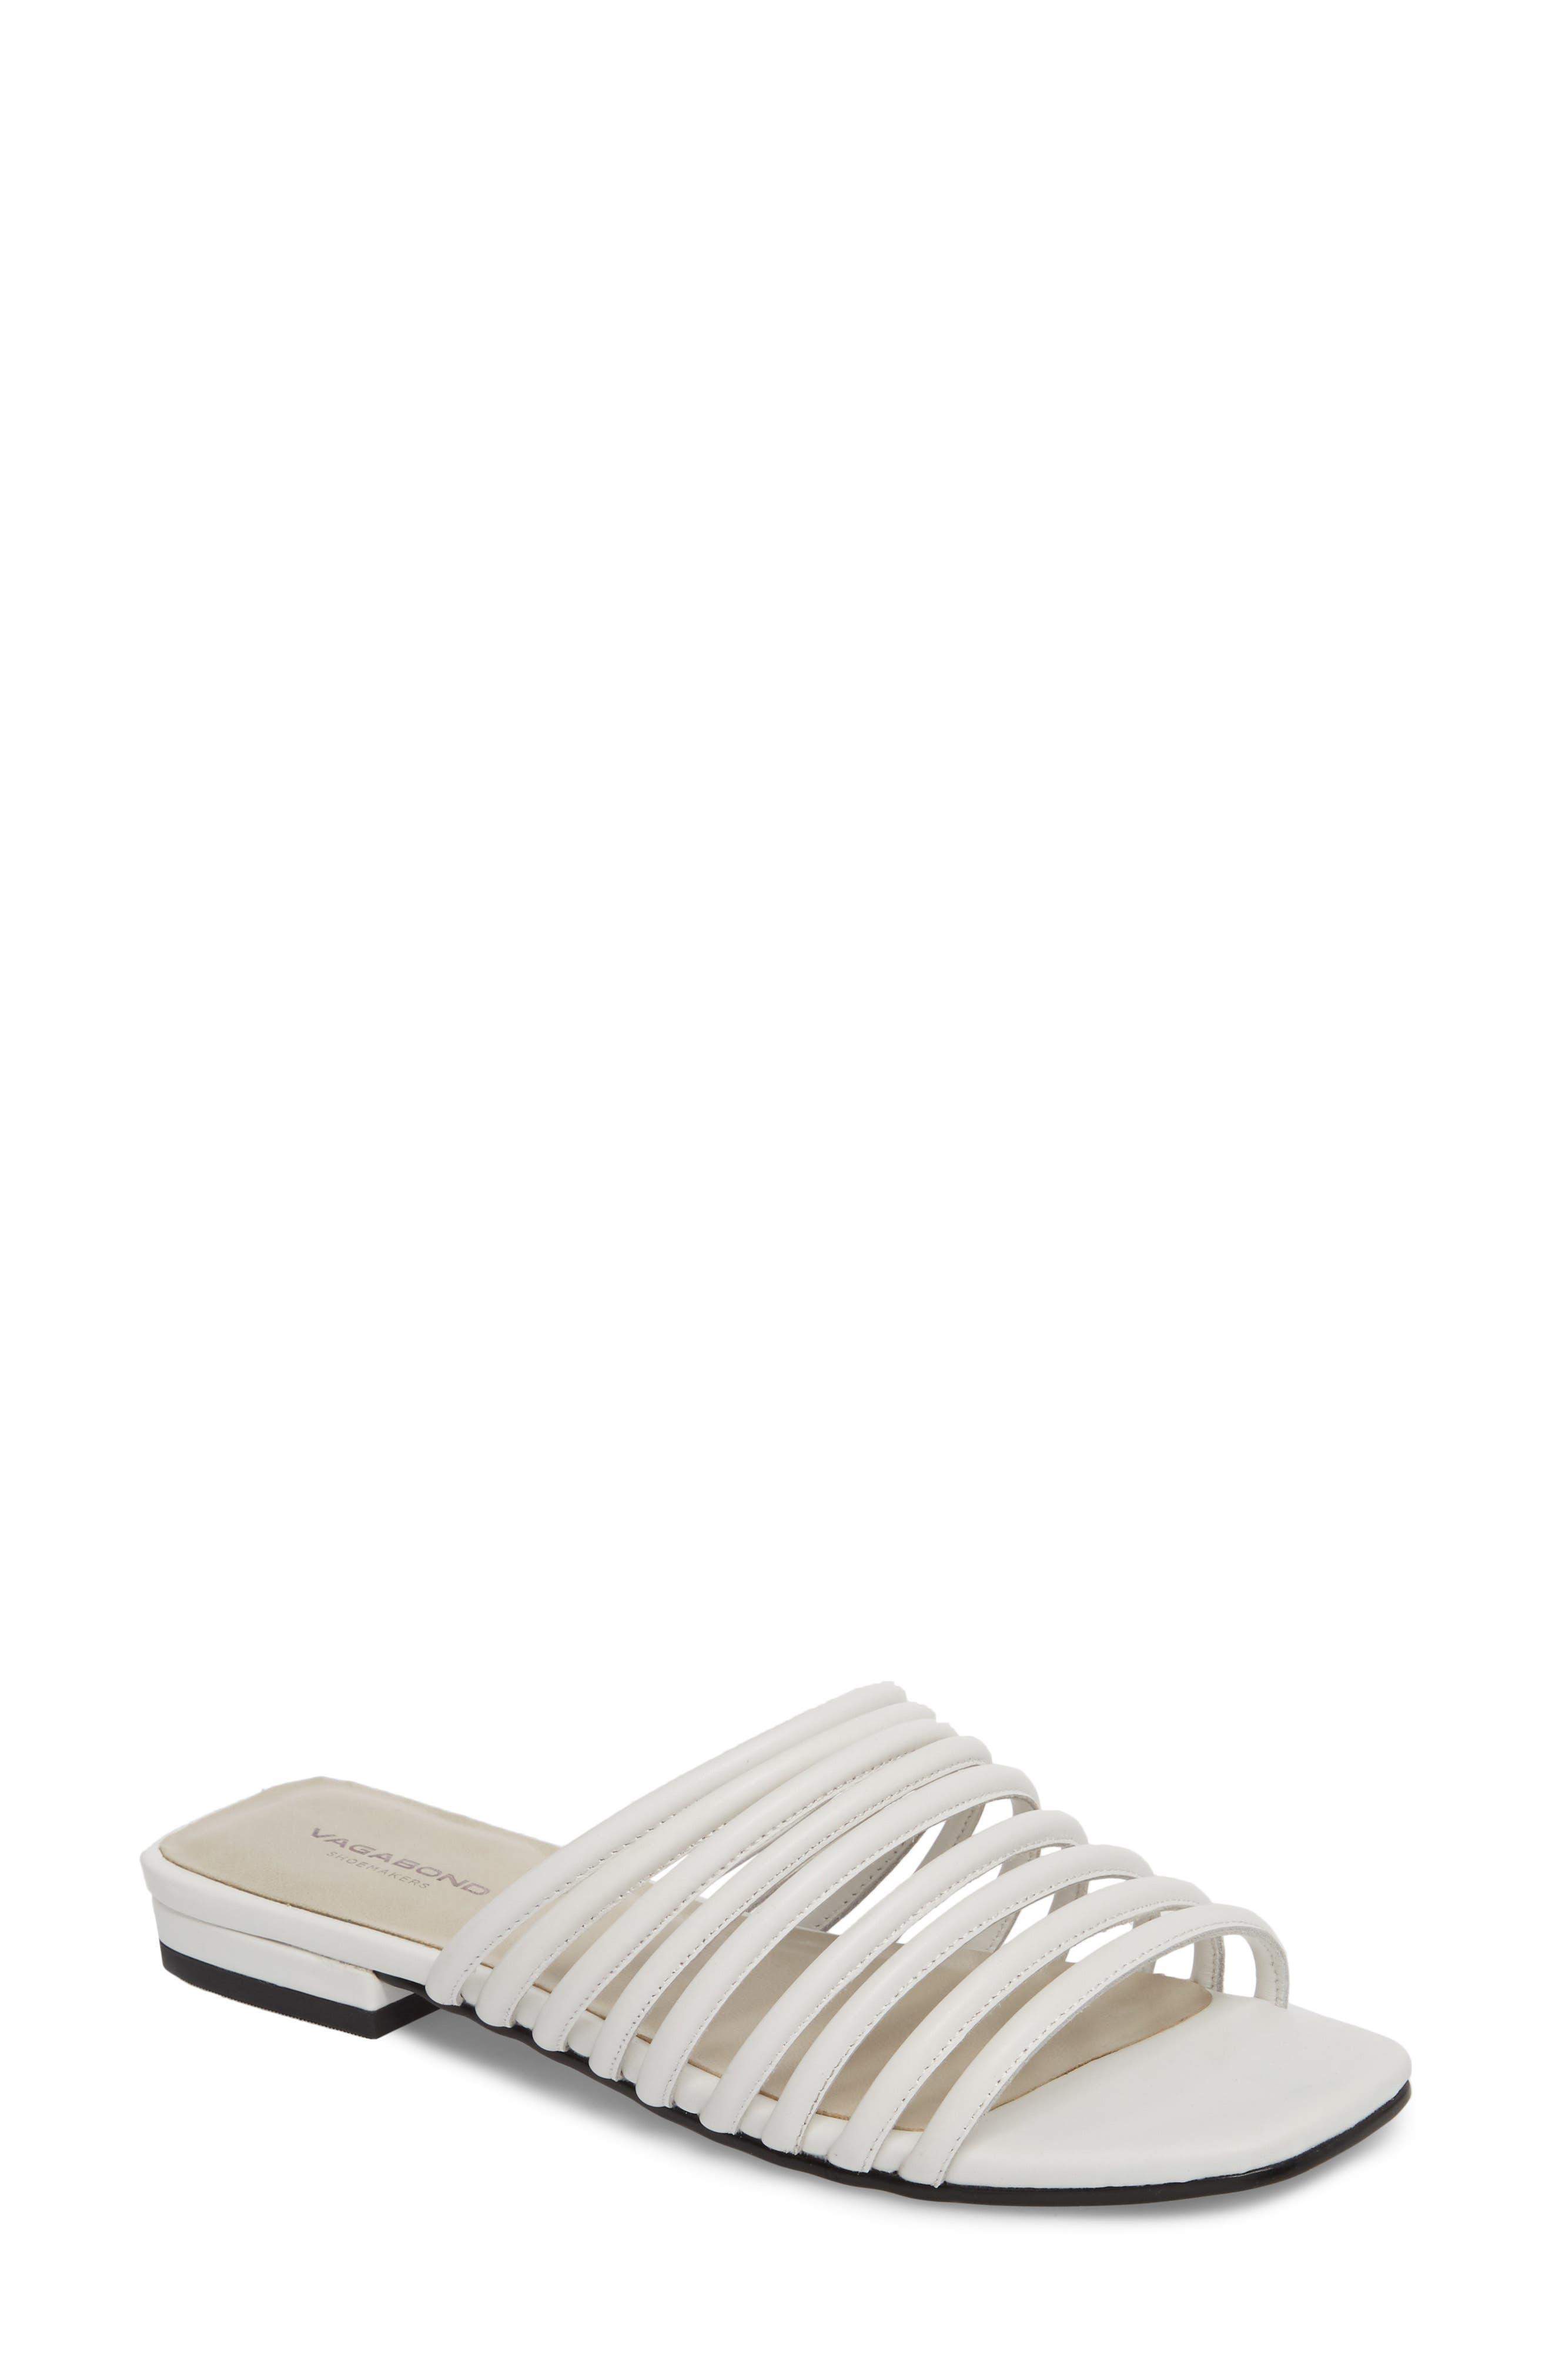 Becky Slide Sandal,                         Main,                         color, White Leather